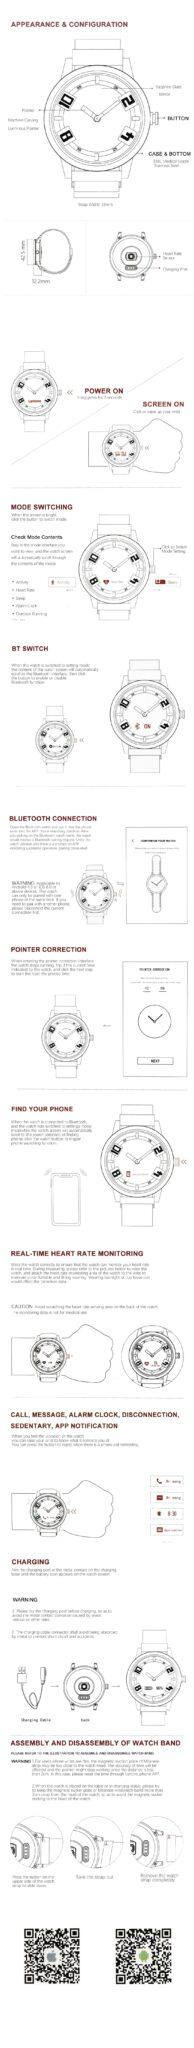 Lenovo Watch X Plus Smart Watch English Manual An Ephemeral